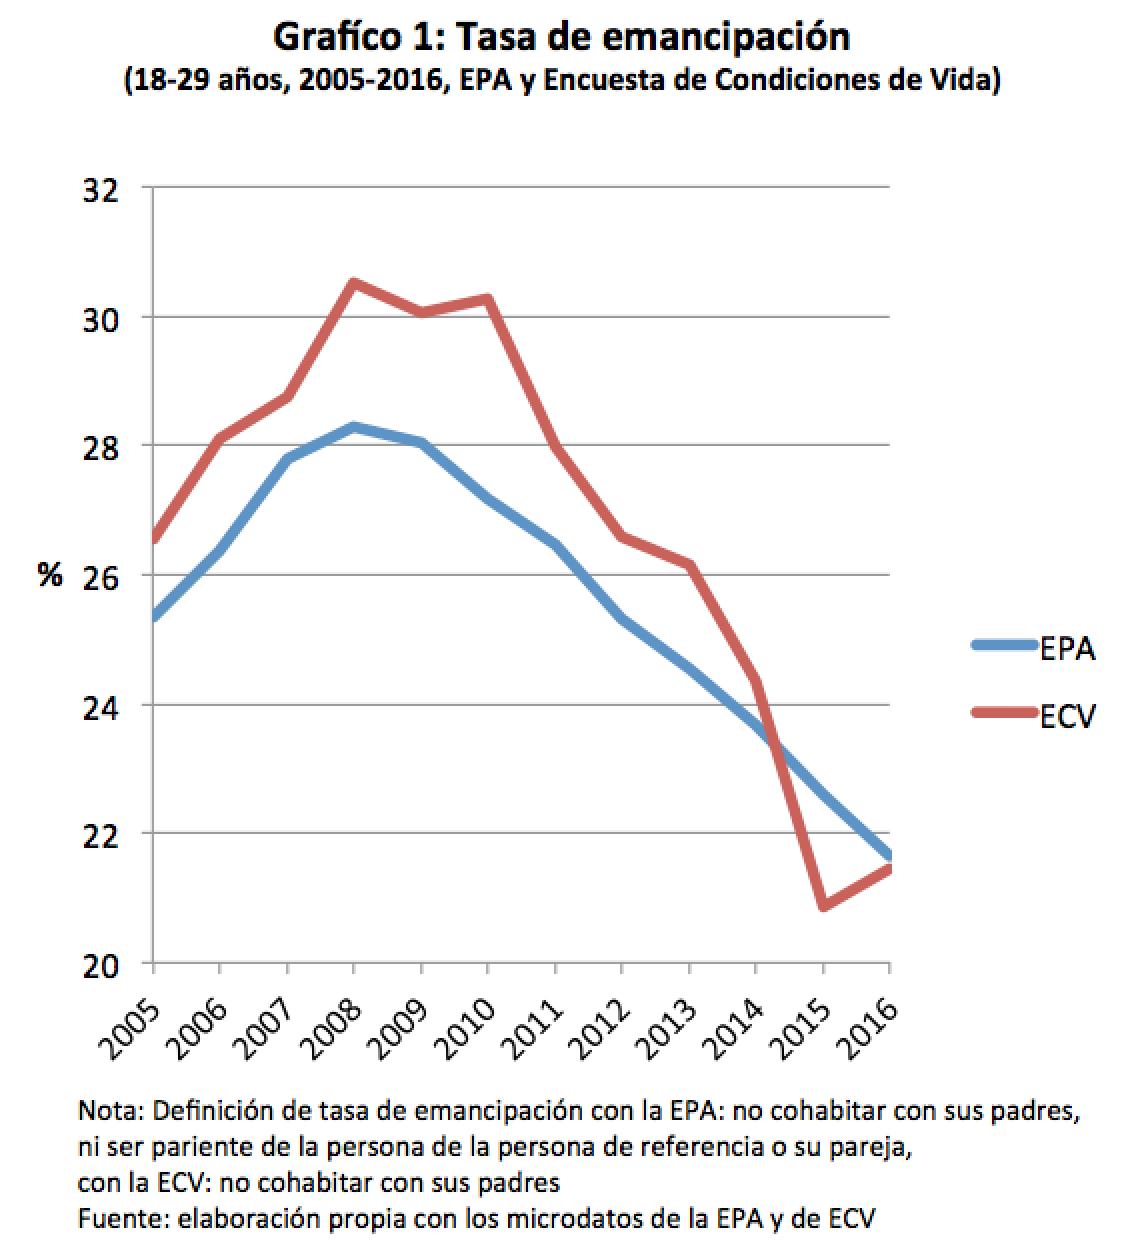 Graf1_Emancipacion_ECV_EPA_2005_2016